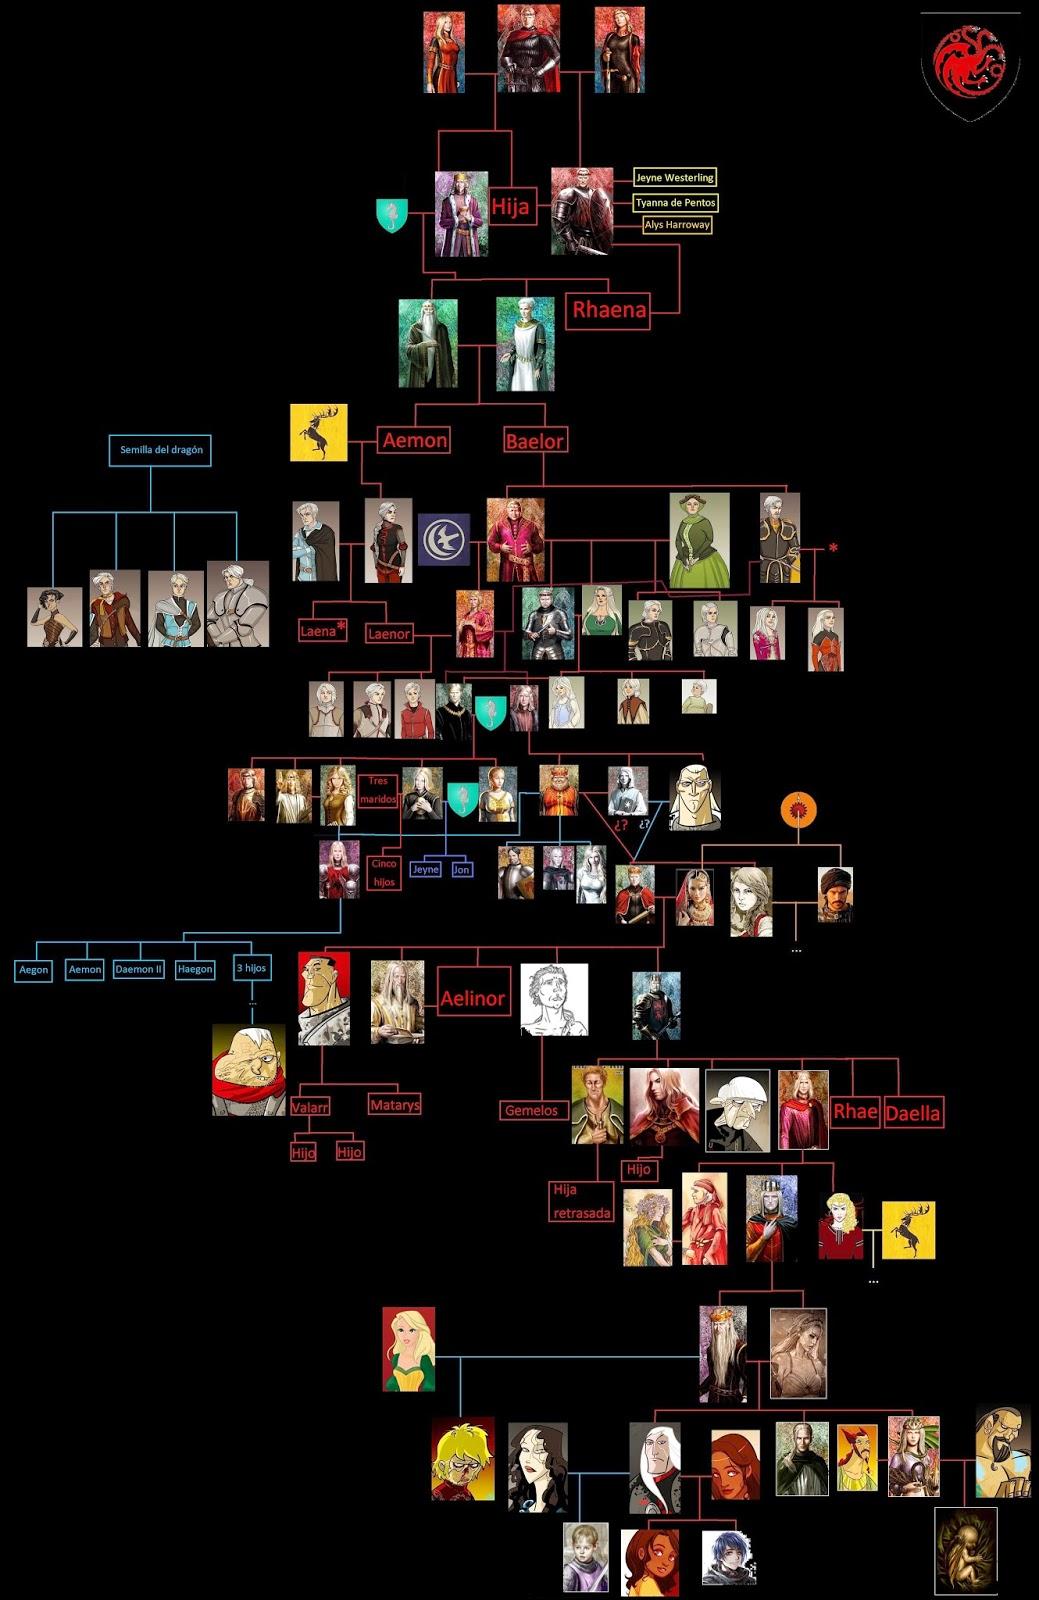 Teorias sobre juego de tronos dinast a targaryen for Arbol genealogico juego de tronos